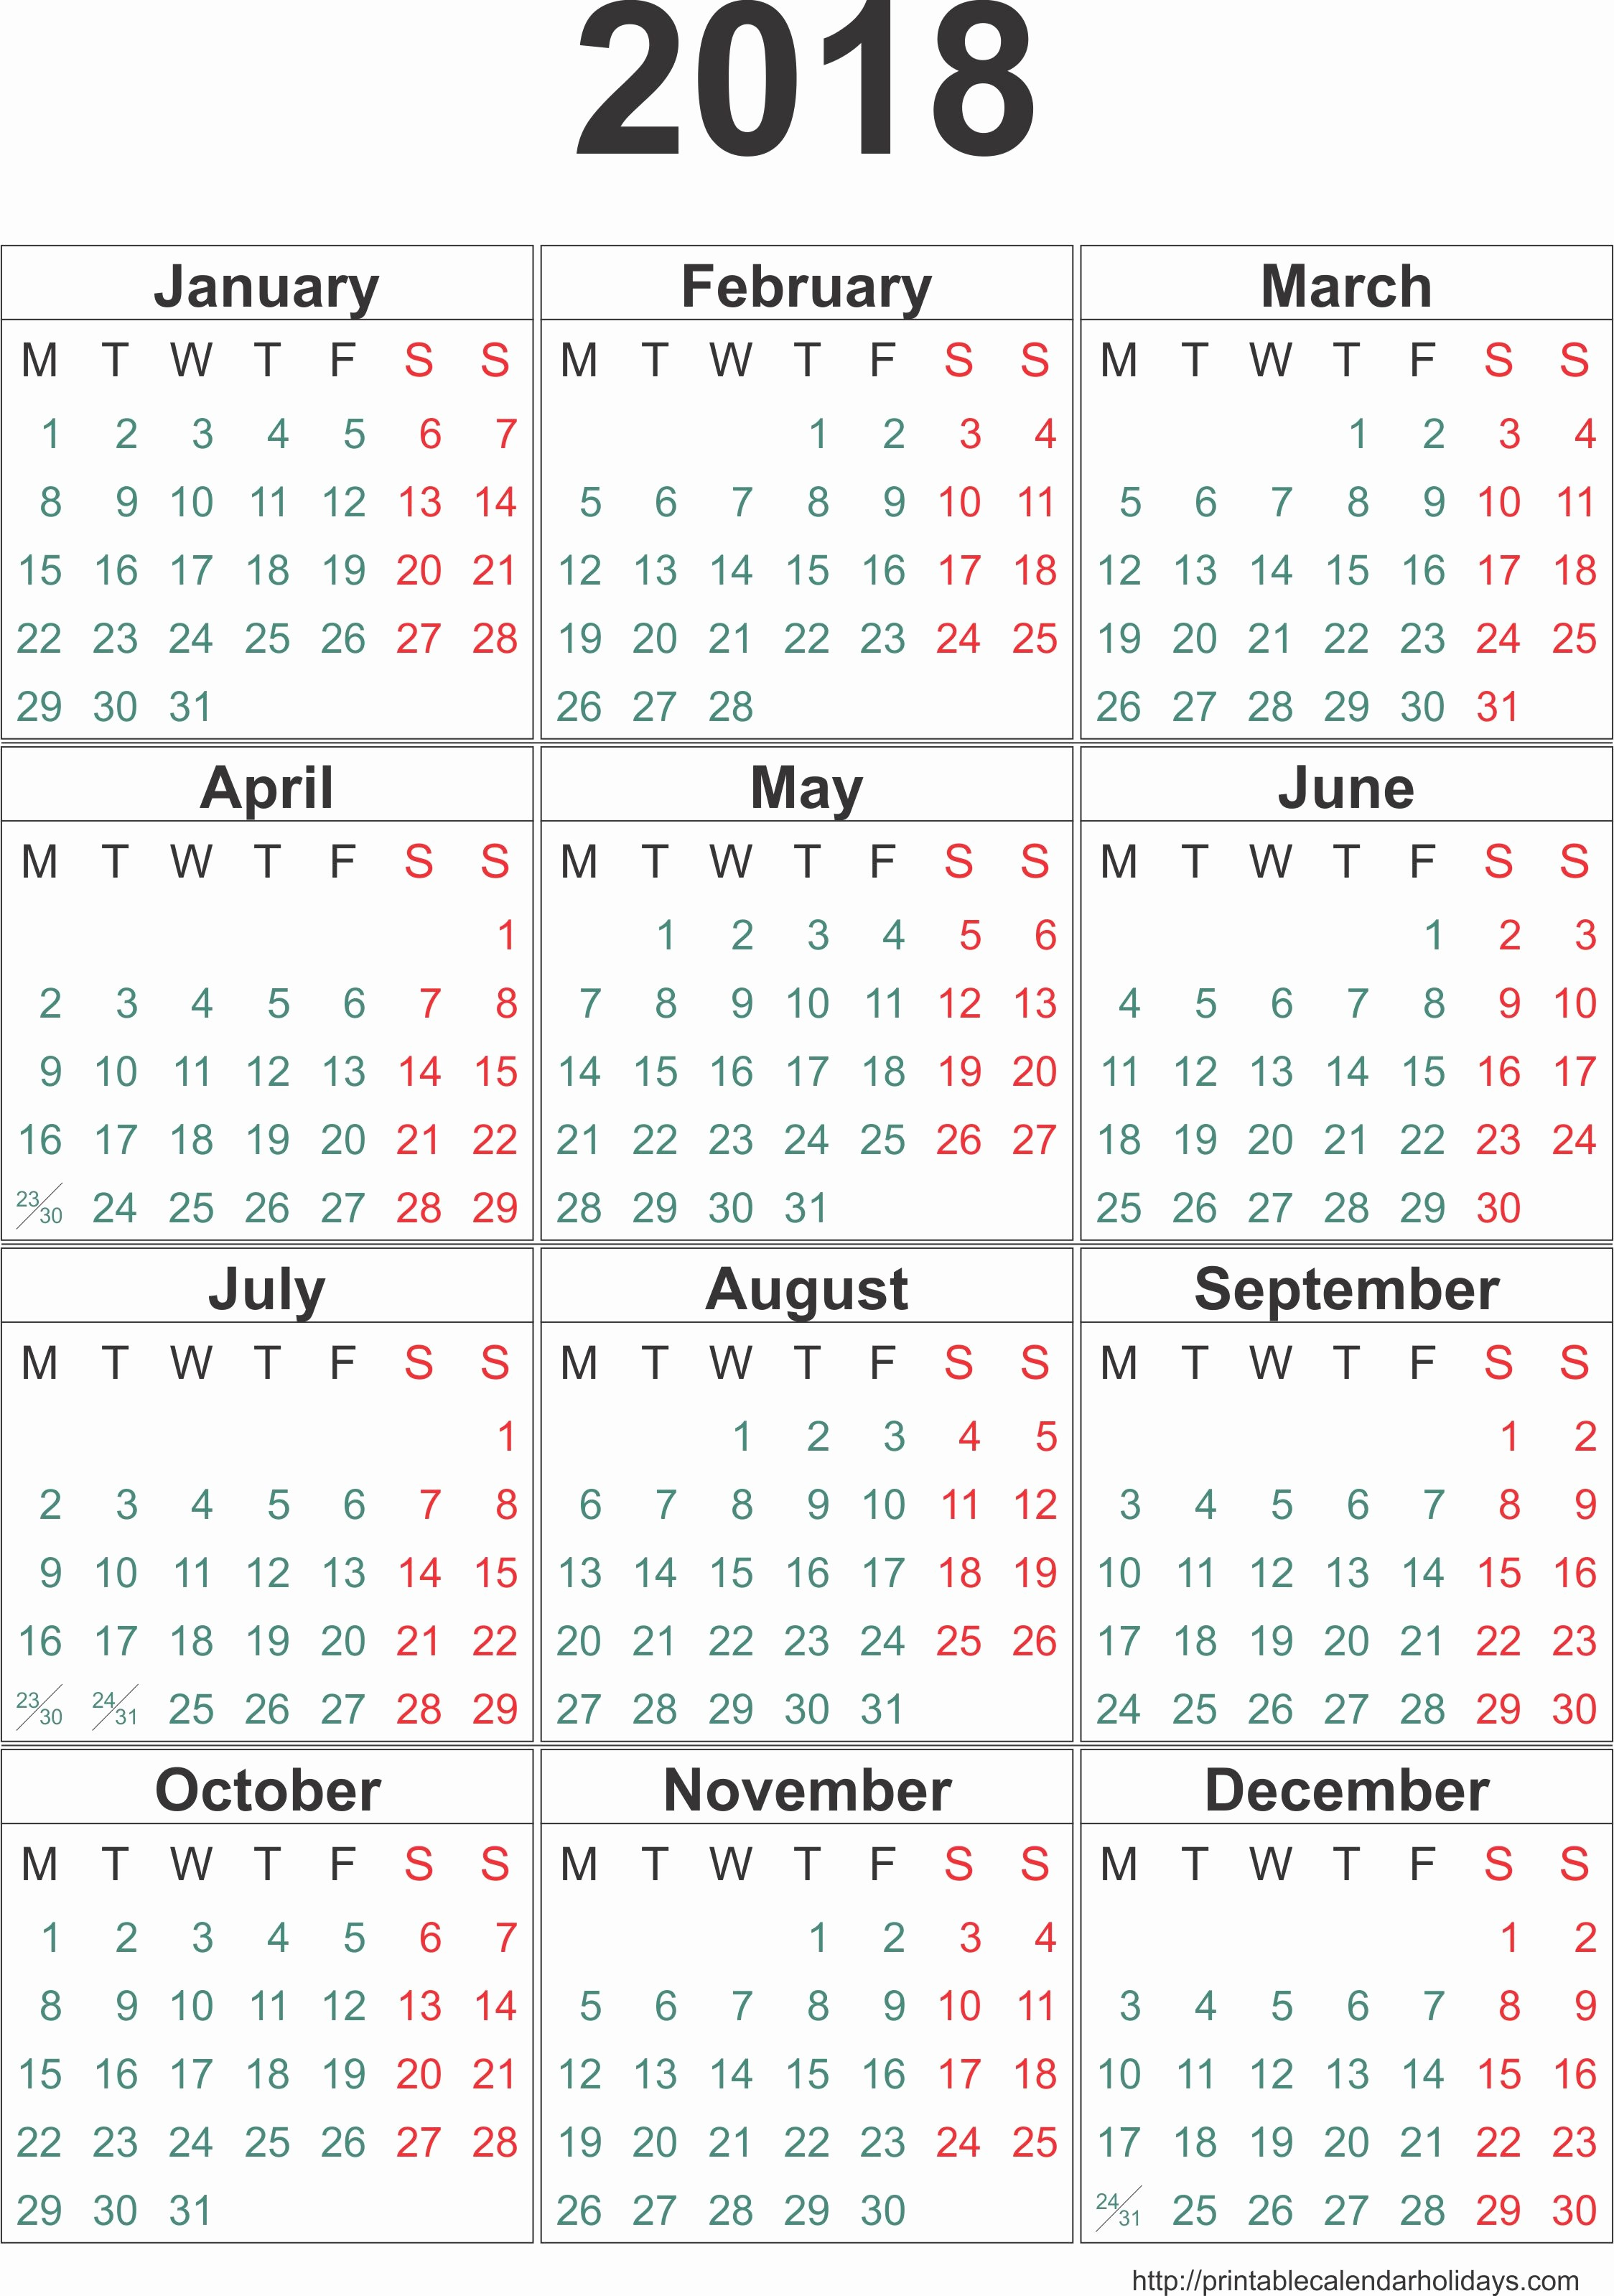 Calendar 2018 Printable with Holidays Inspirational Free 2018 Calendar with Holidays